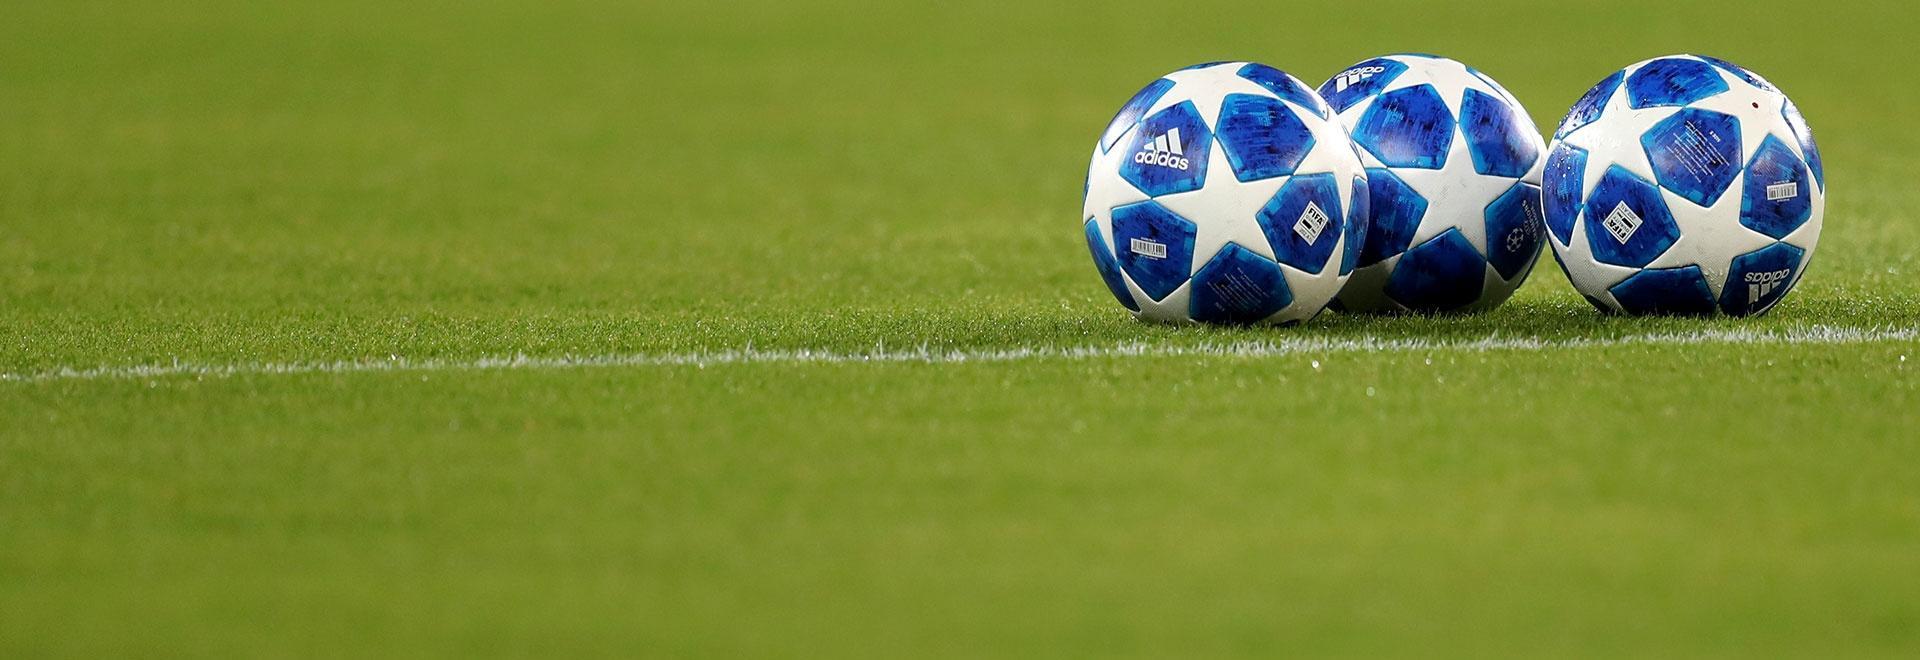 Barcellona - Inter 28/04/10